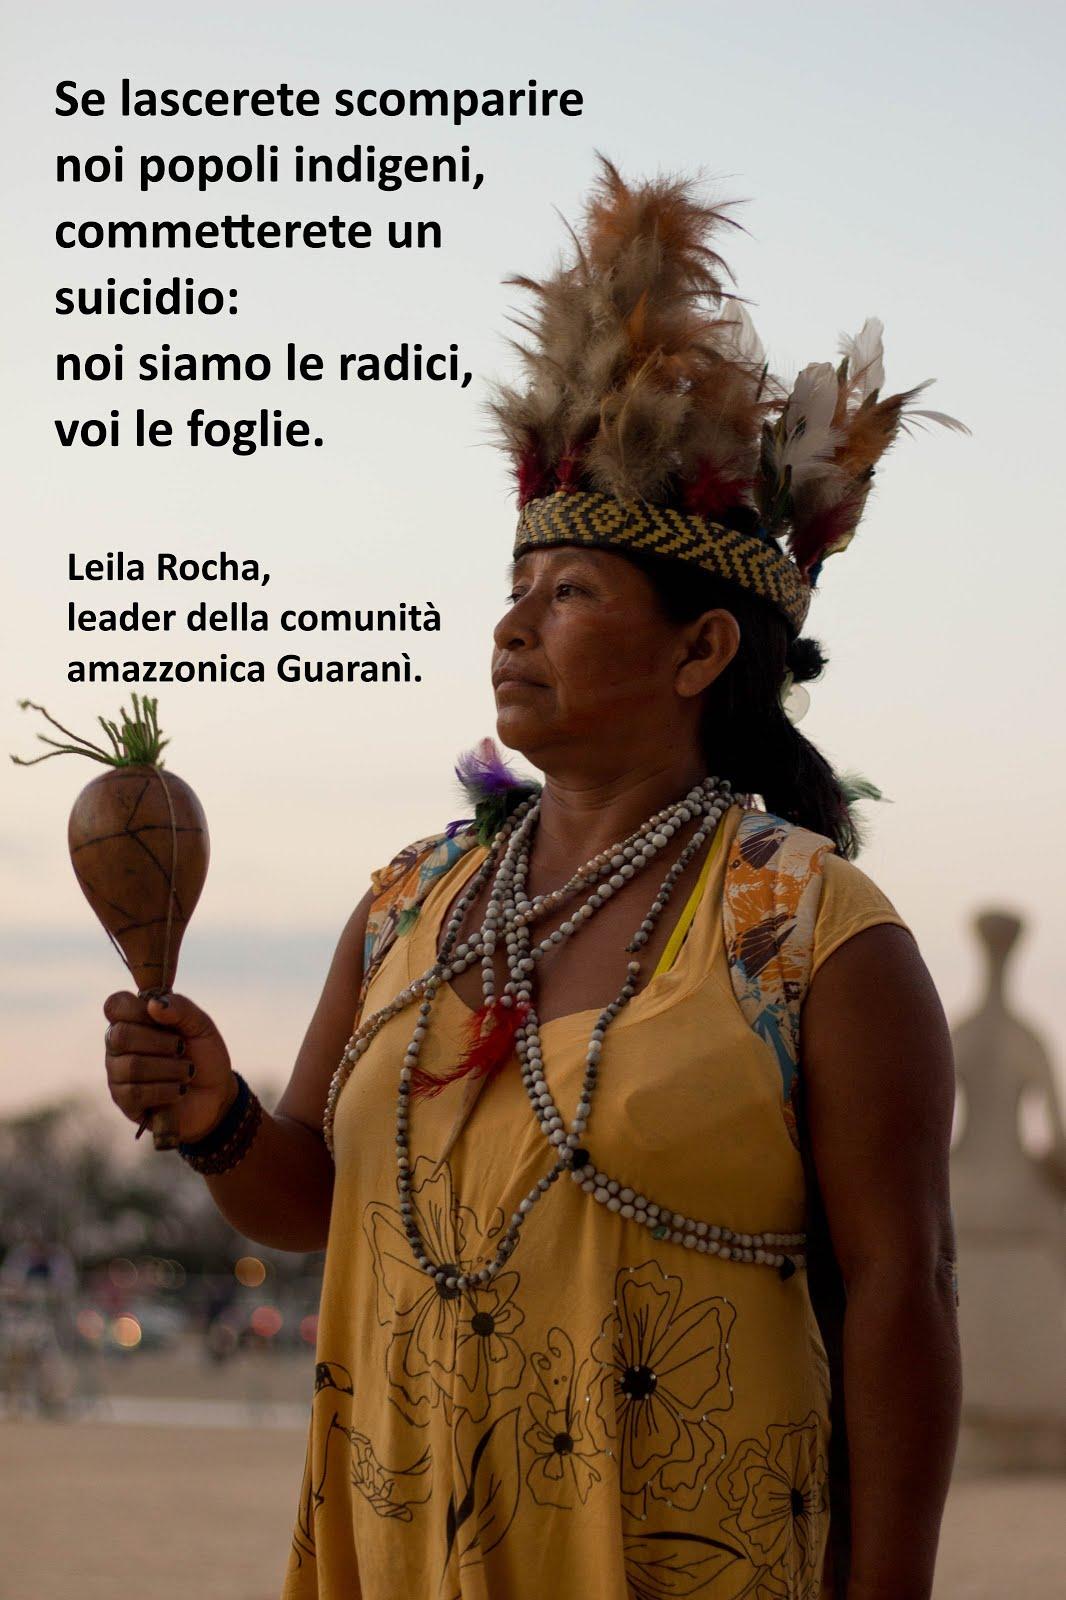 LEILA ROCHA